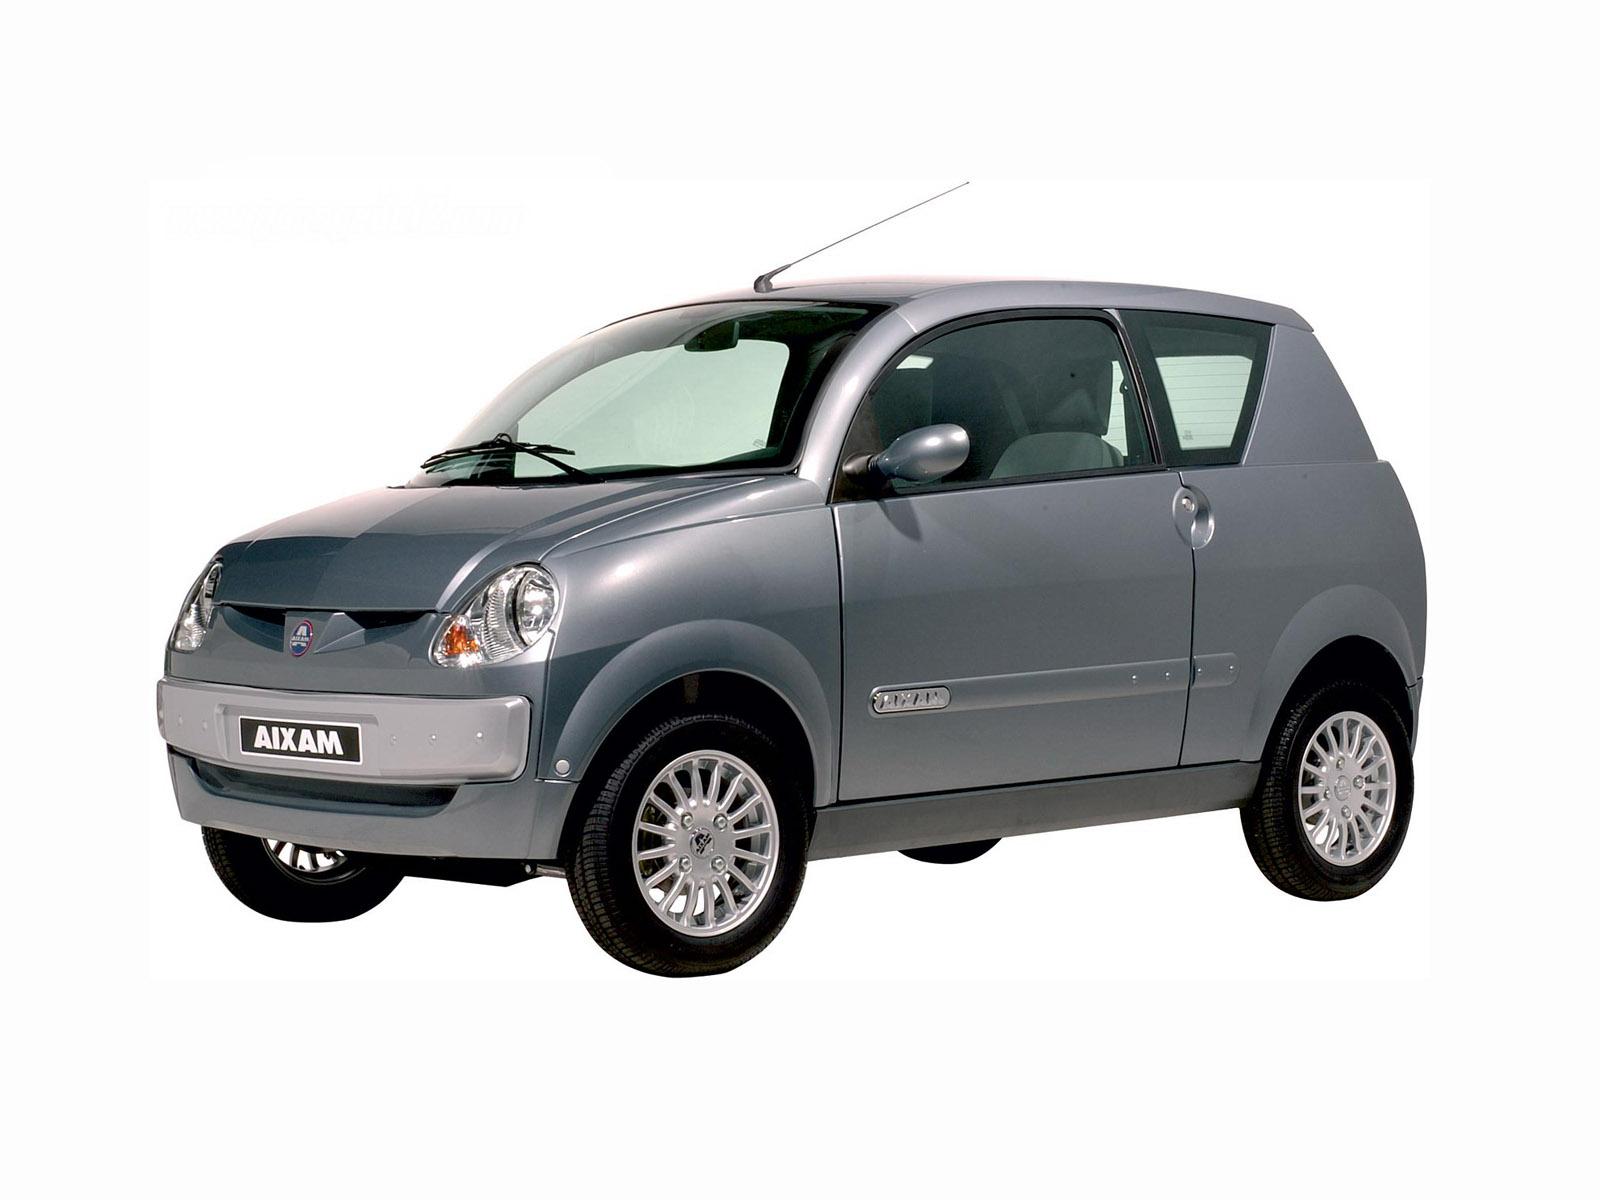 Aixam A E on Newest Acura Model